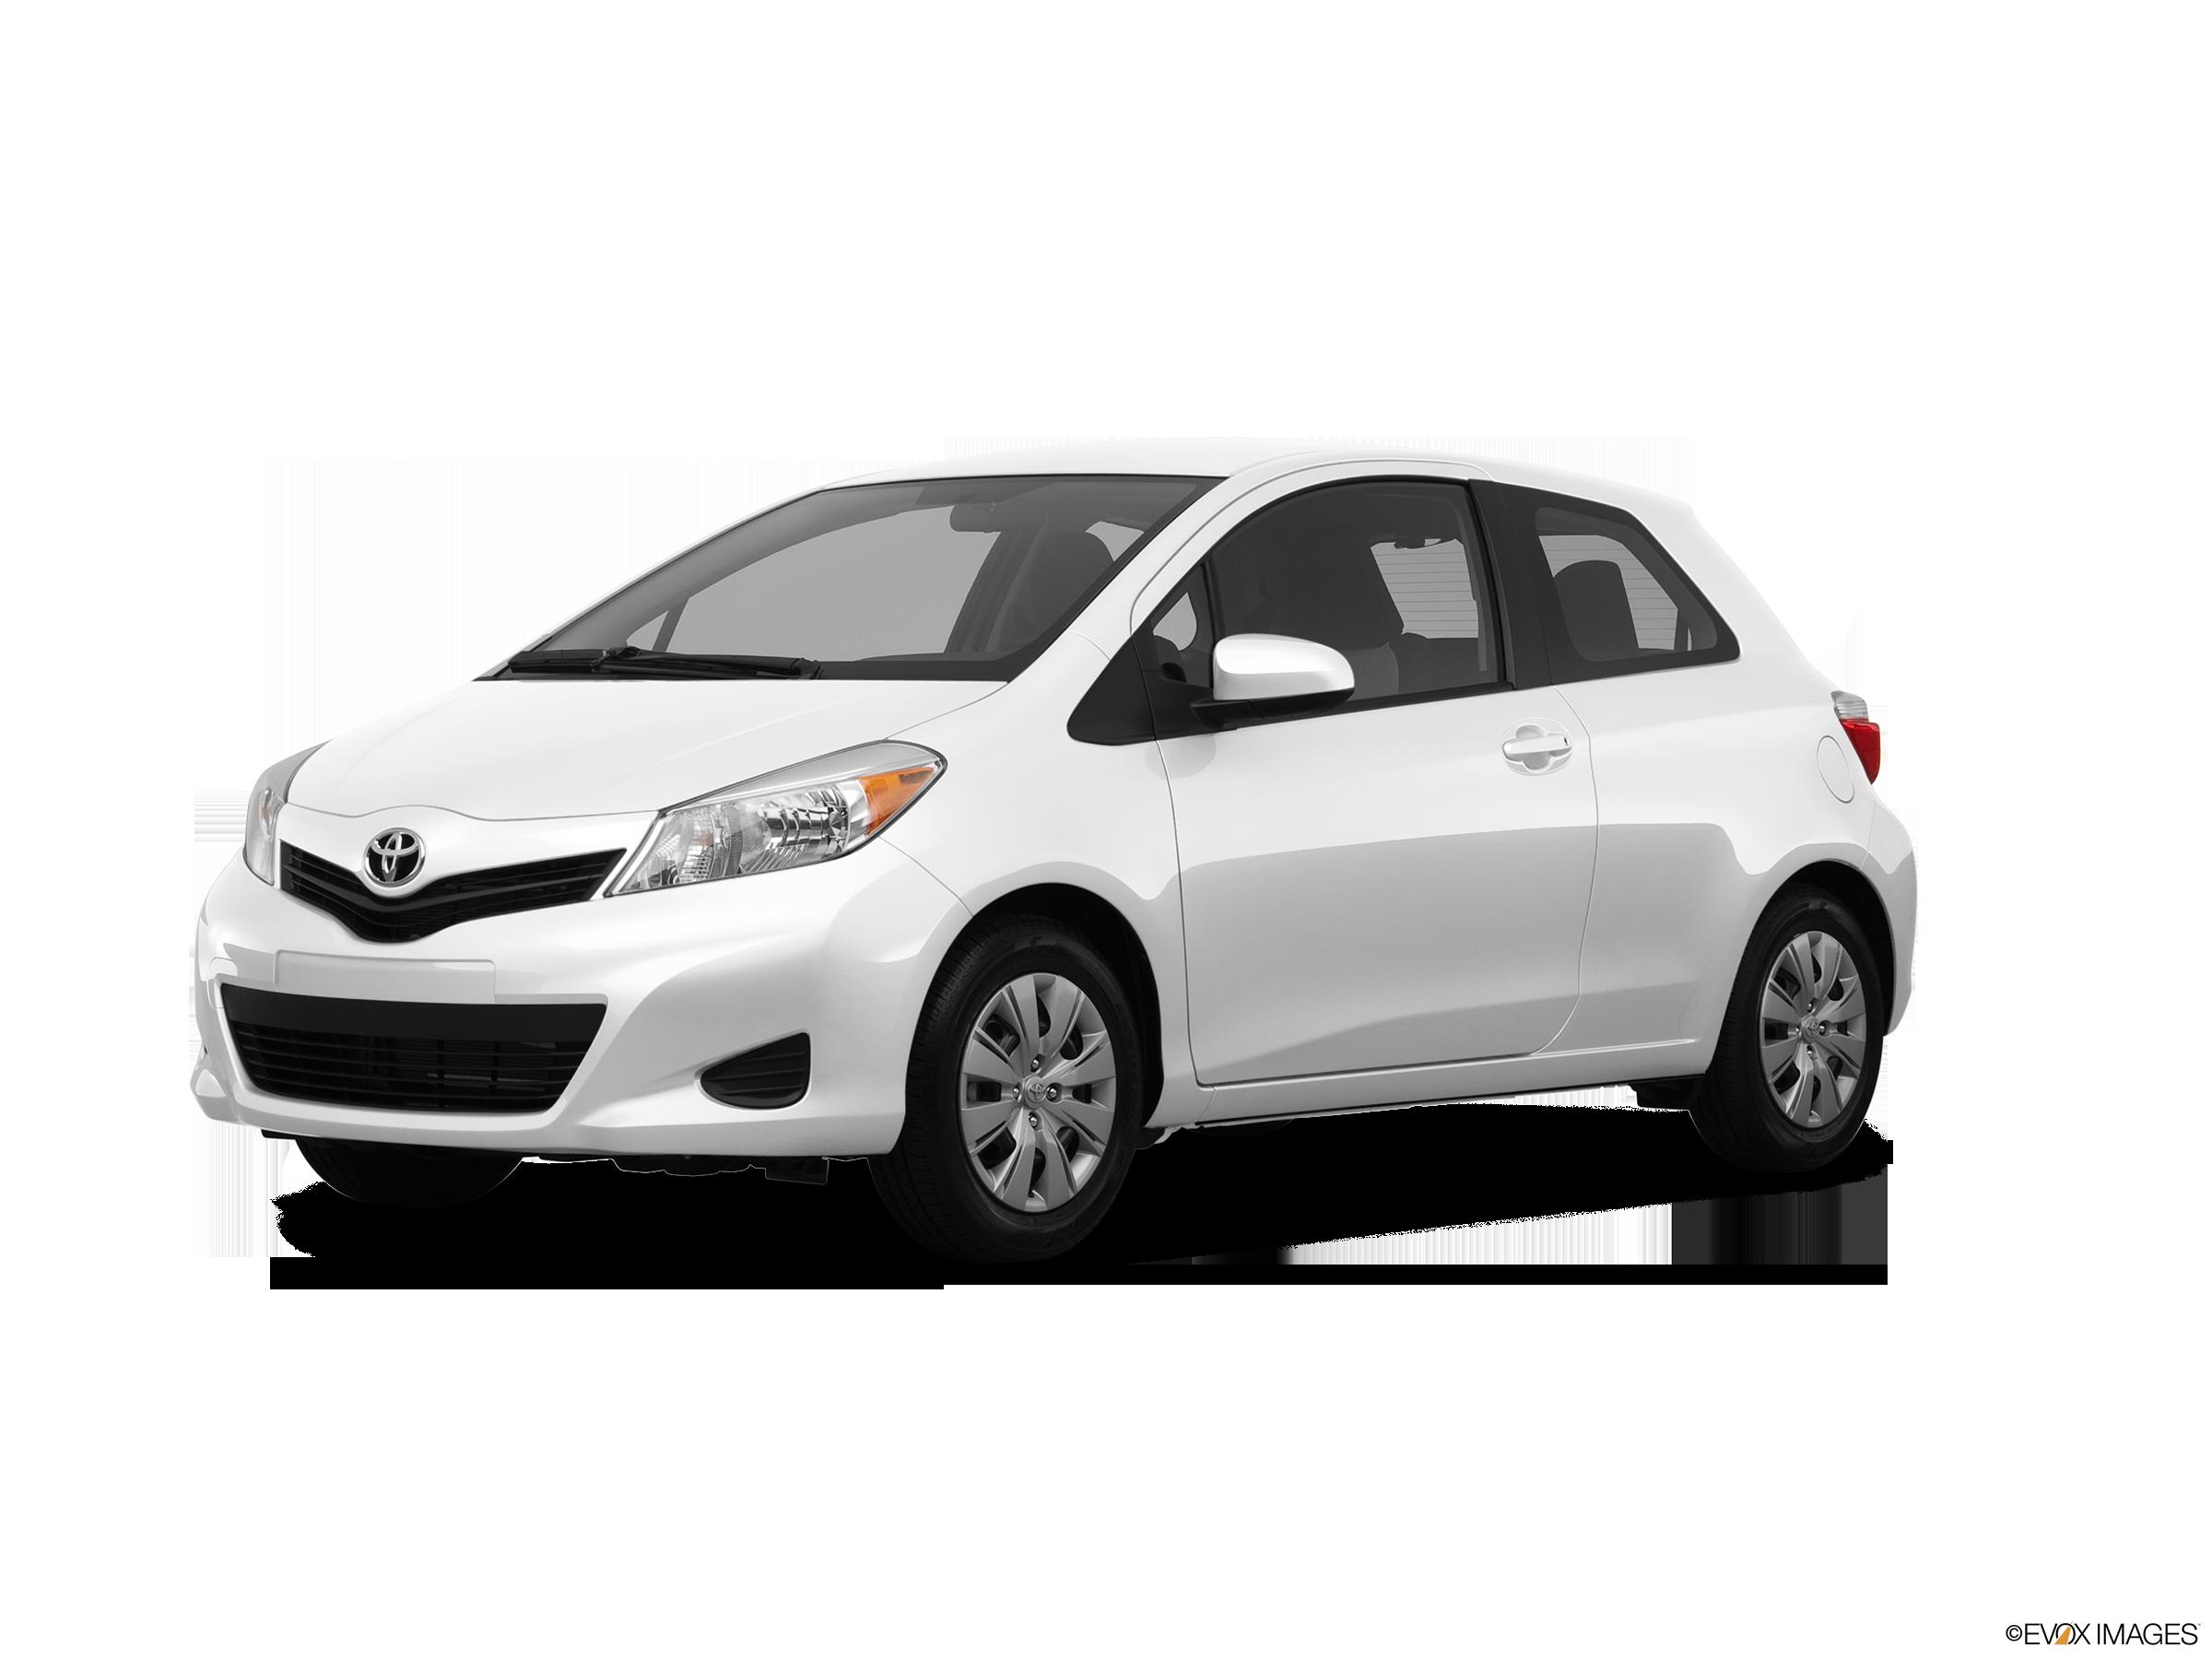 Kelebihan Toyota Yaris 2012 Tangguh